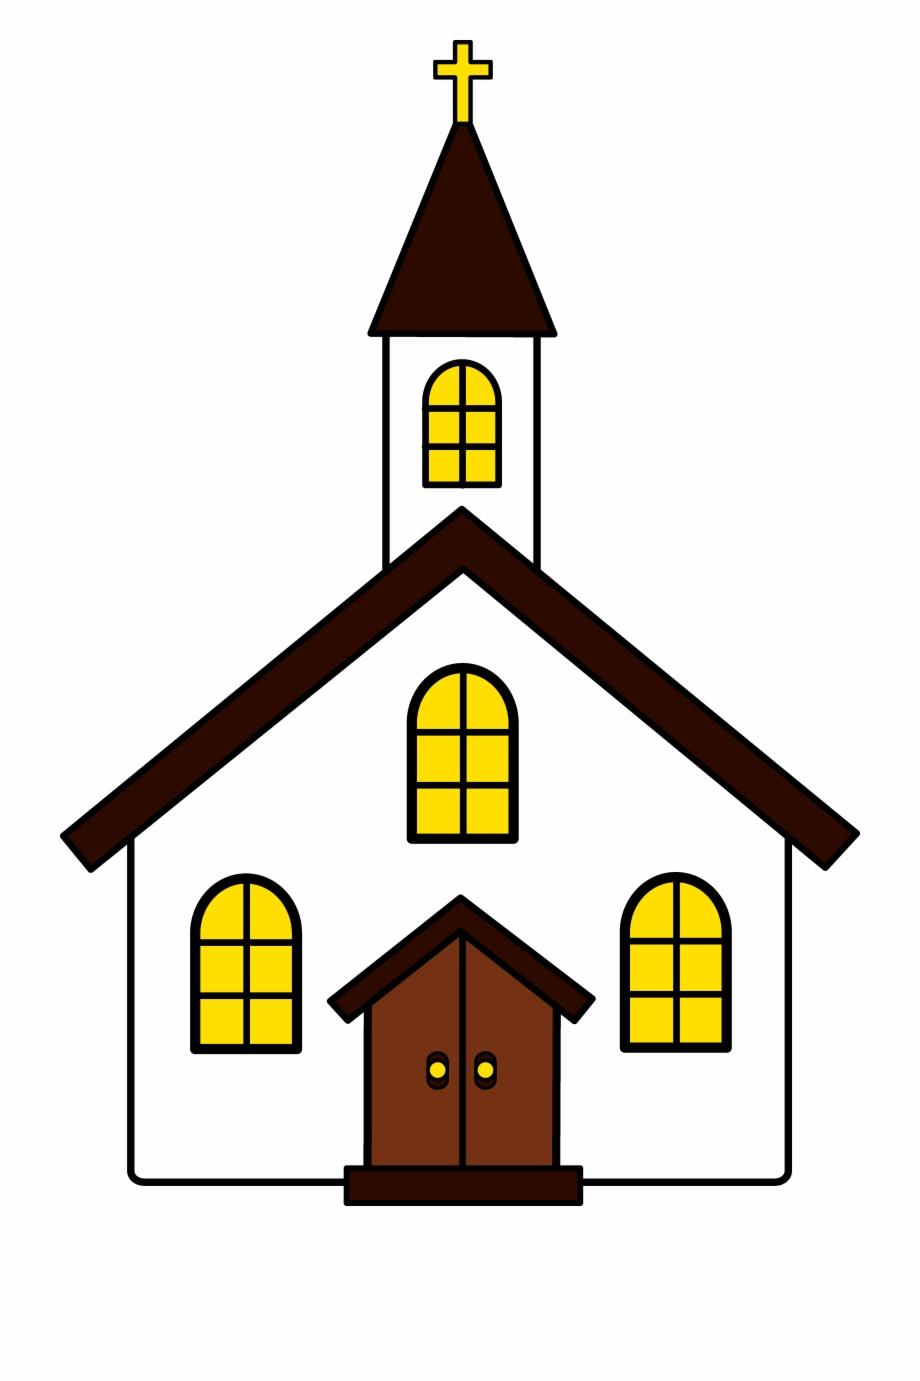 Catholic parish clipart jpg black and white download Place Clipart Catholic Church - Church Clipart, Transparent Png ... jpg black and white download